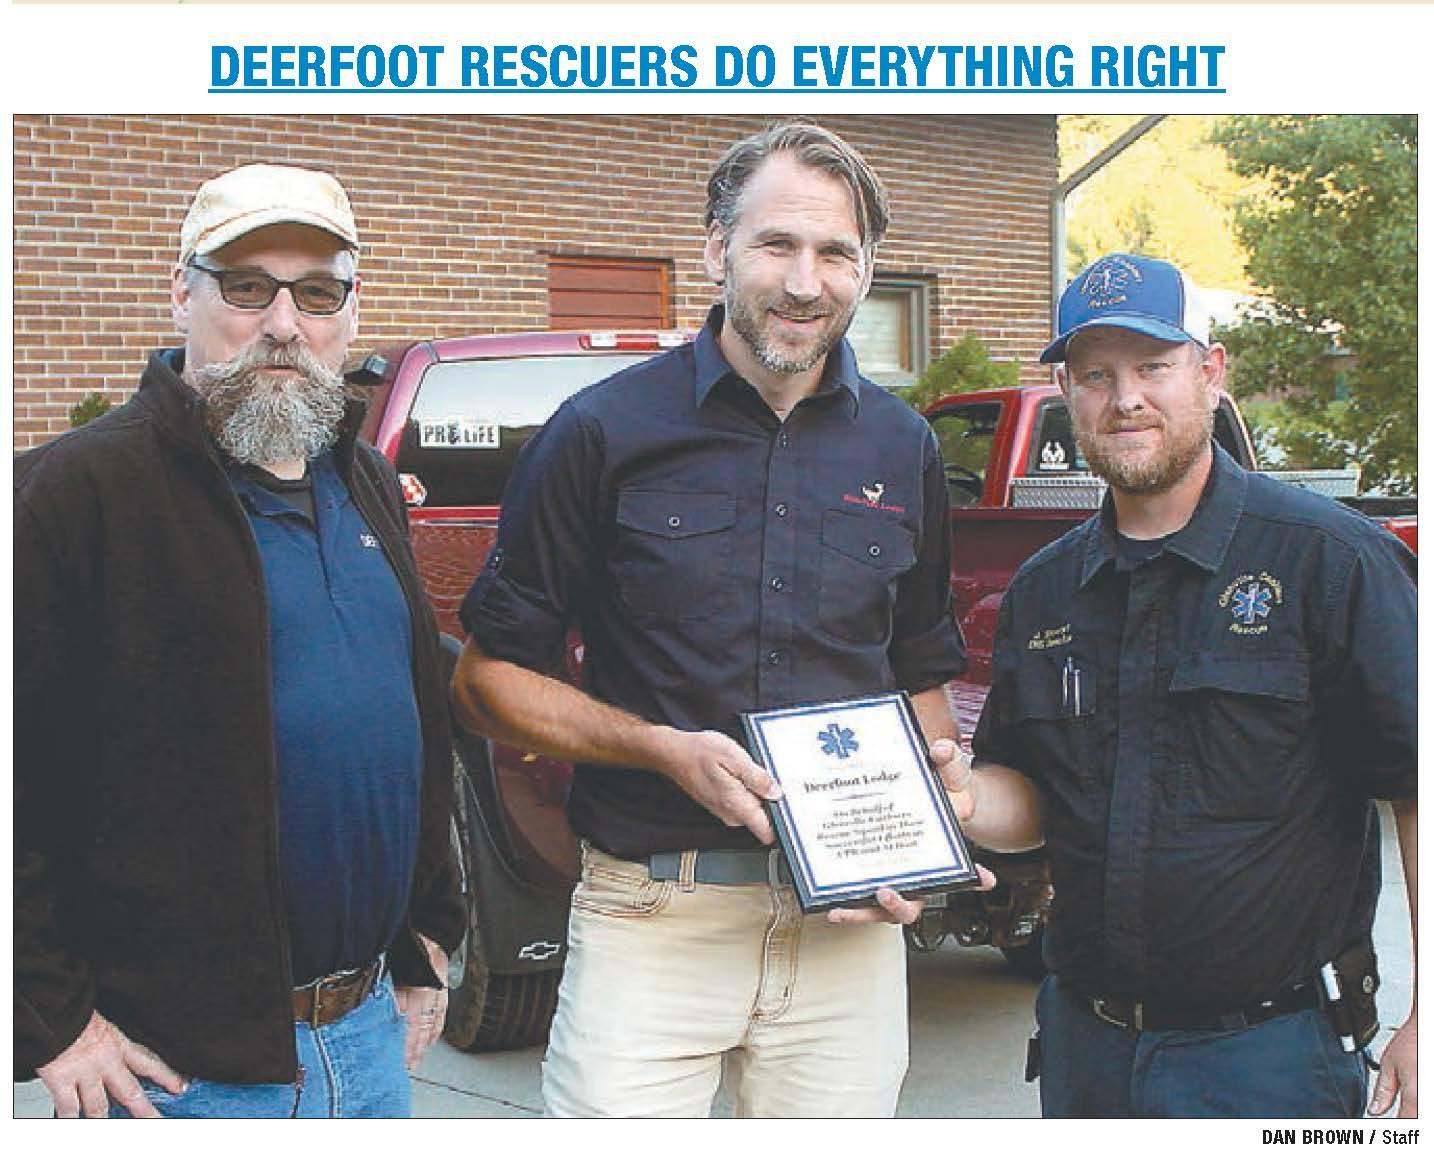 Deerfoot Blue Ridge Rescue Recognized